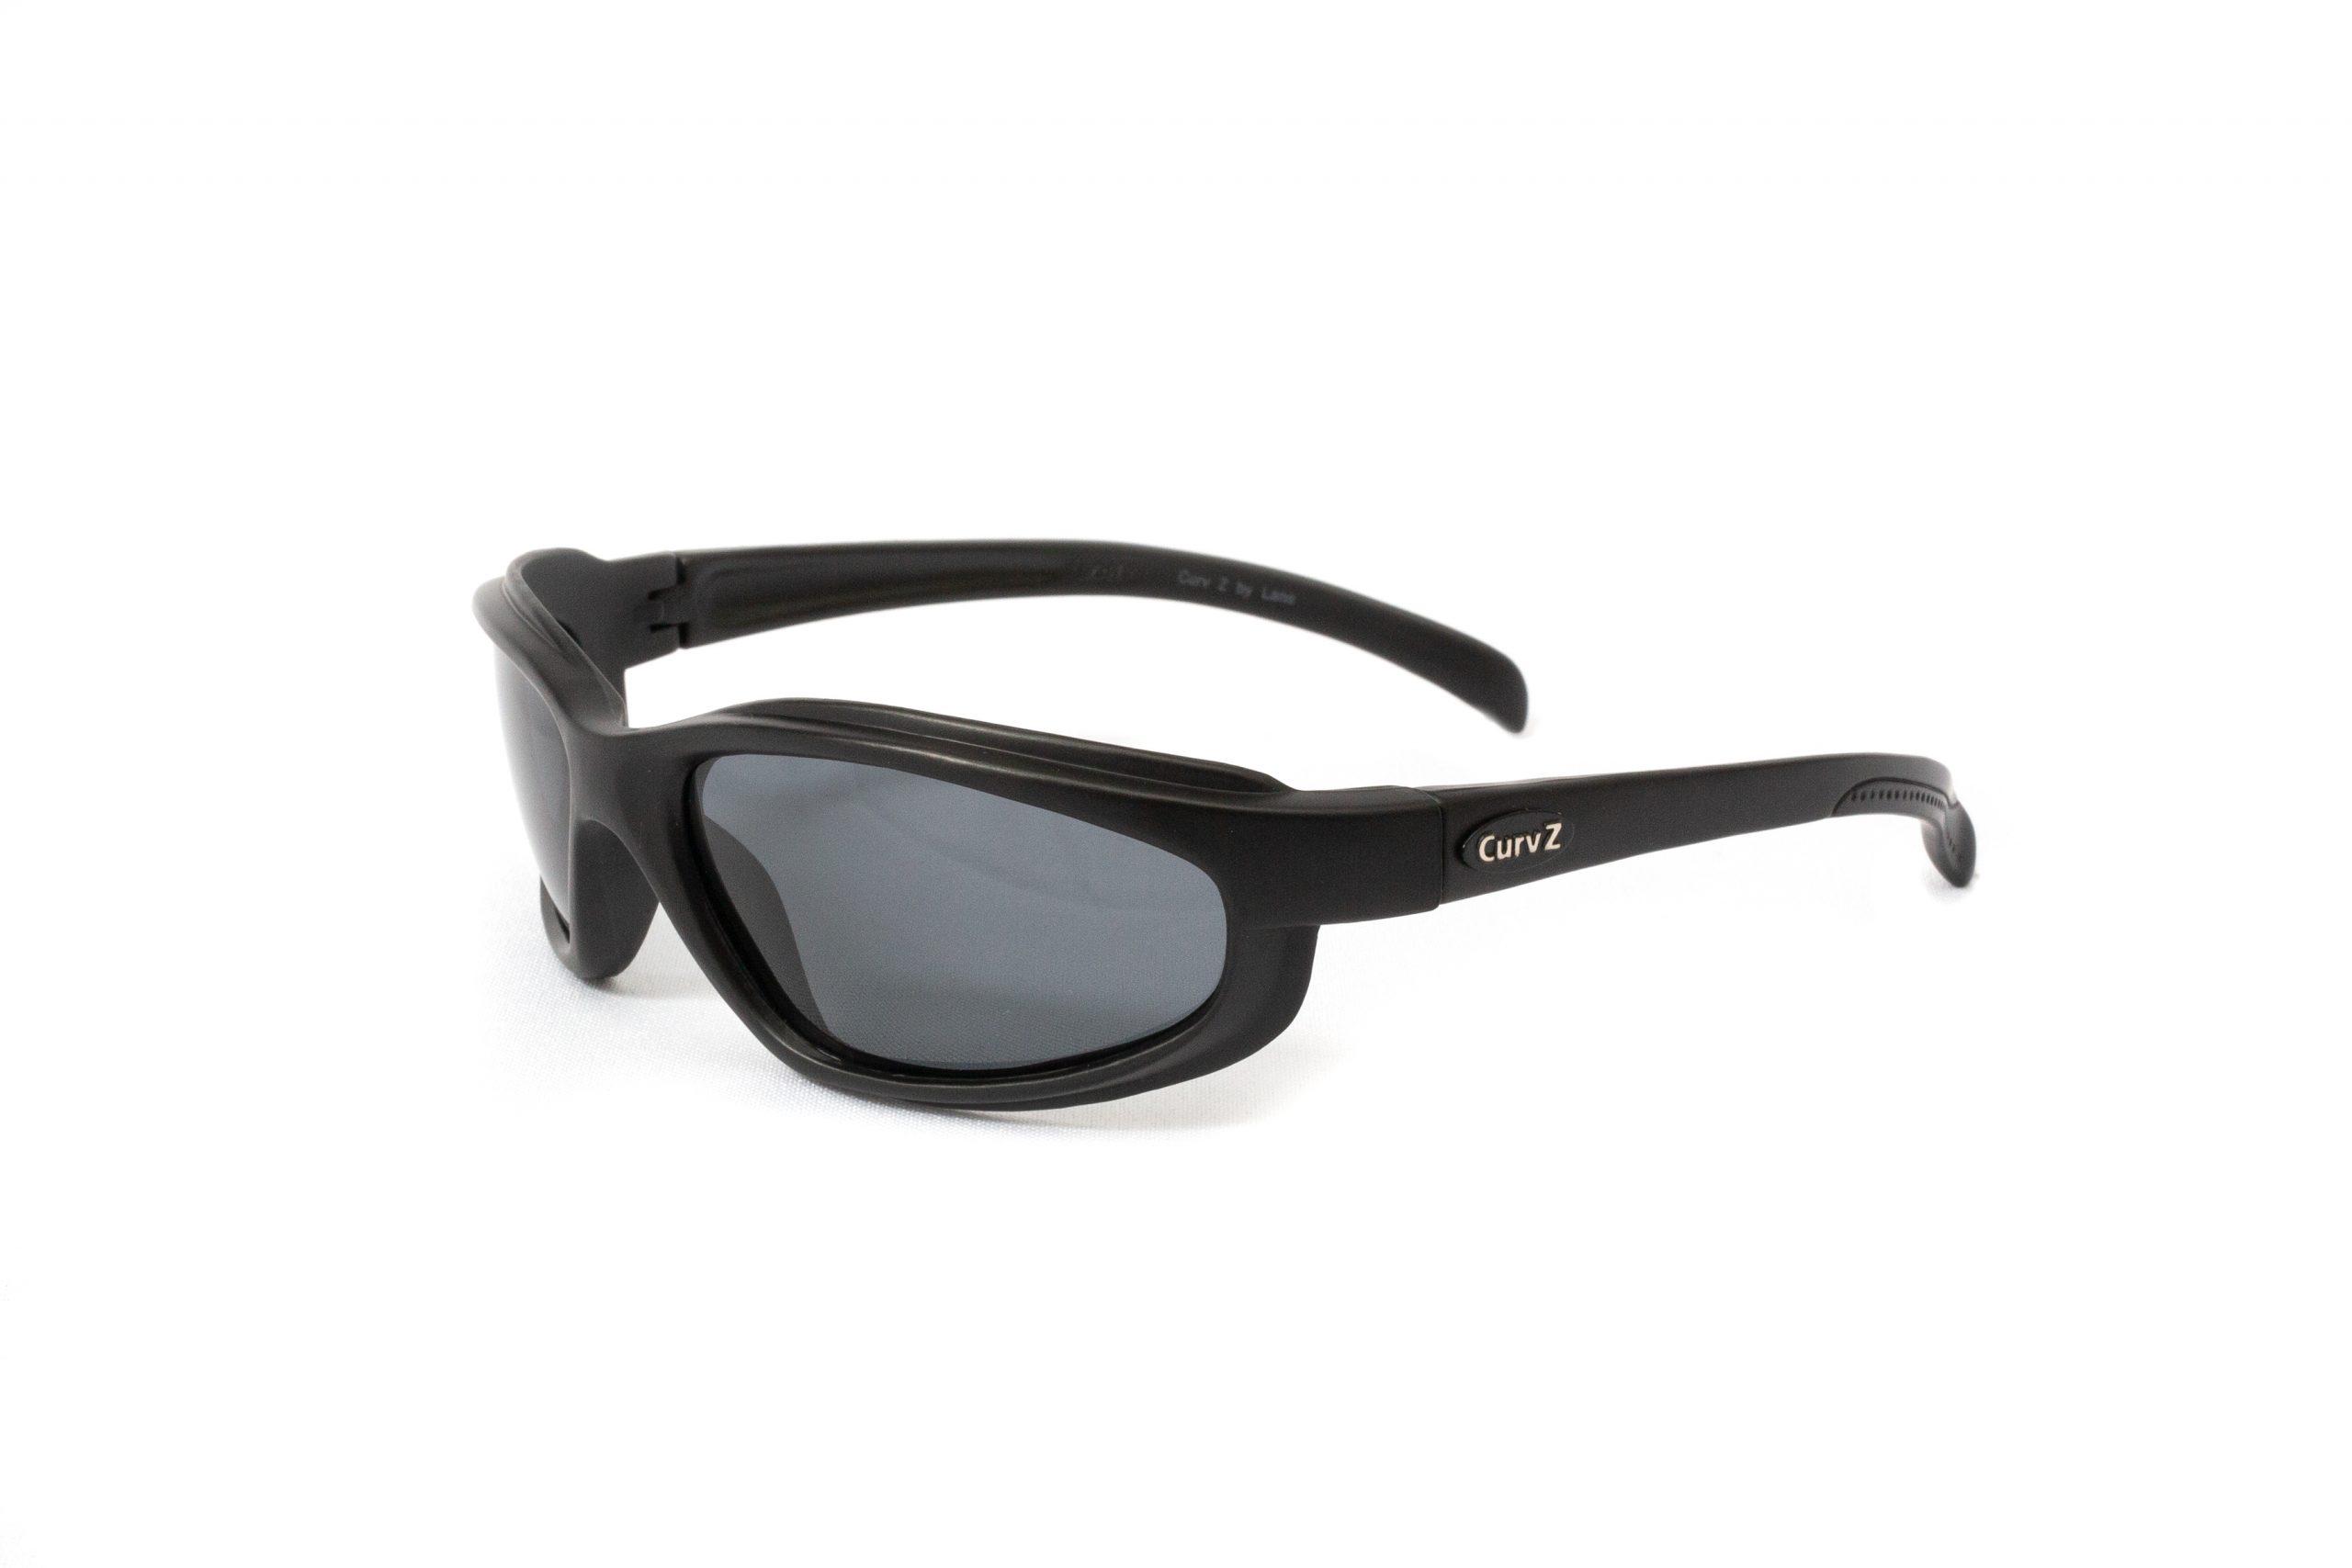 02-20 - CurvZ Polarized Smoke Sunglasses with Smoke Lenses and Matte Black Frames